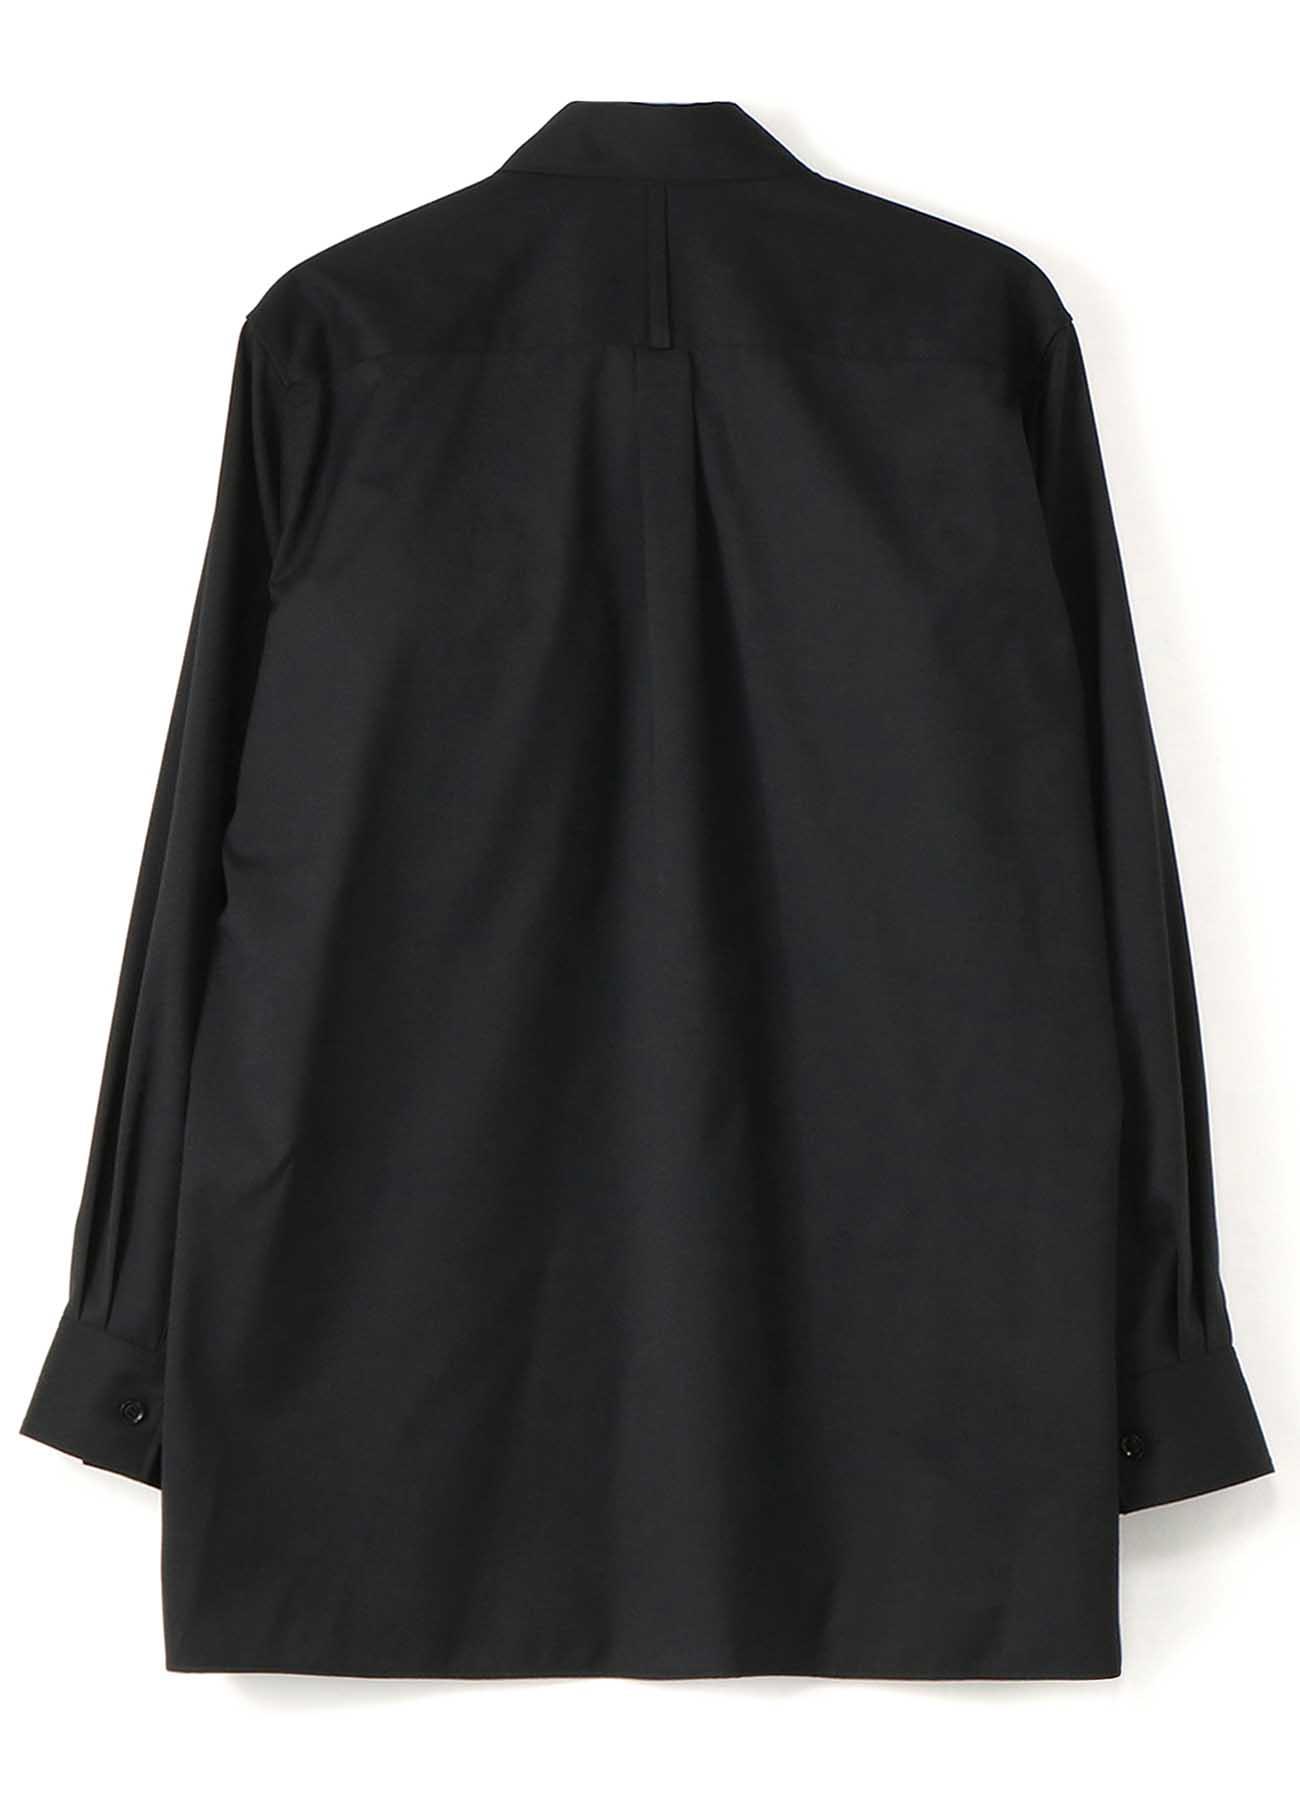 T/W Gabardine Storm Shield Double Pocket Shirt